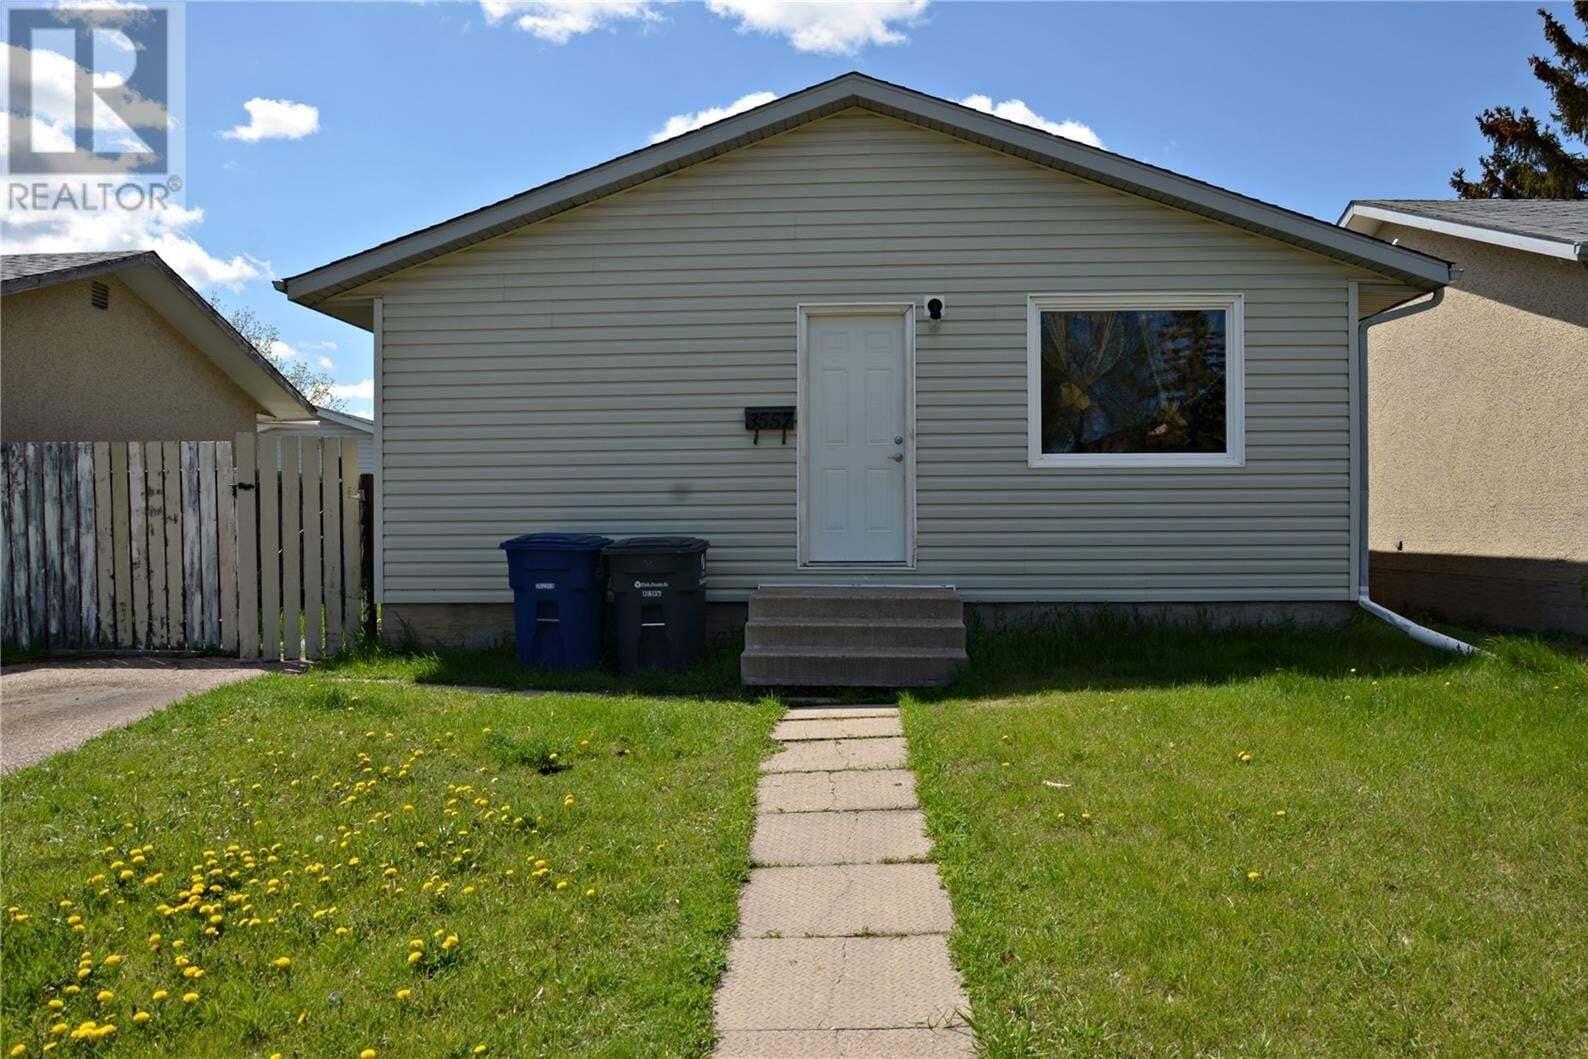 House for sale at 3557 Diefenbaker Dr Saskatoon Saskatchewan - MLS: SK810144